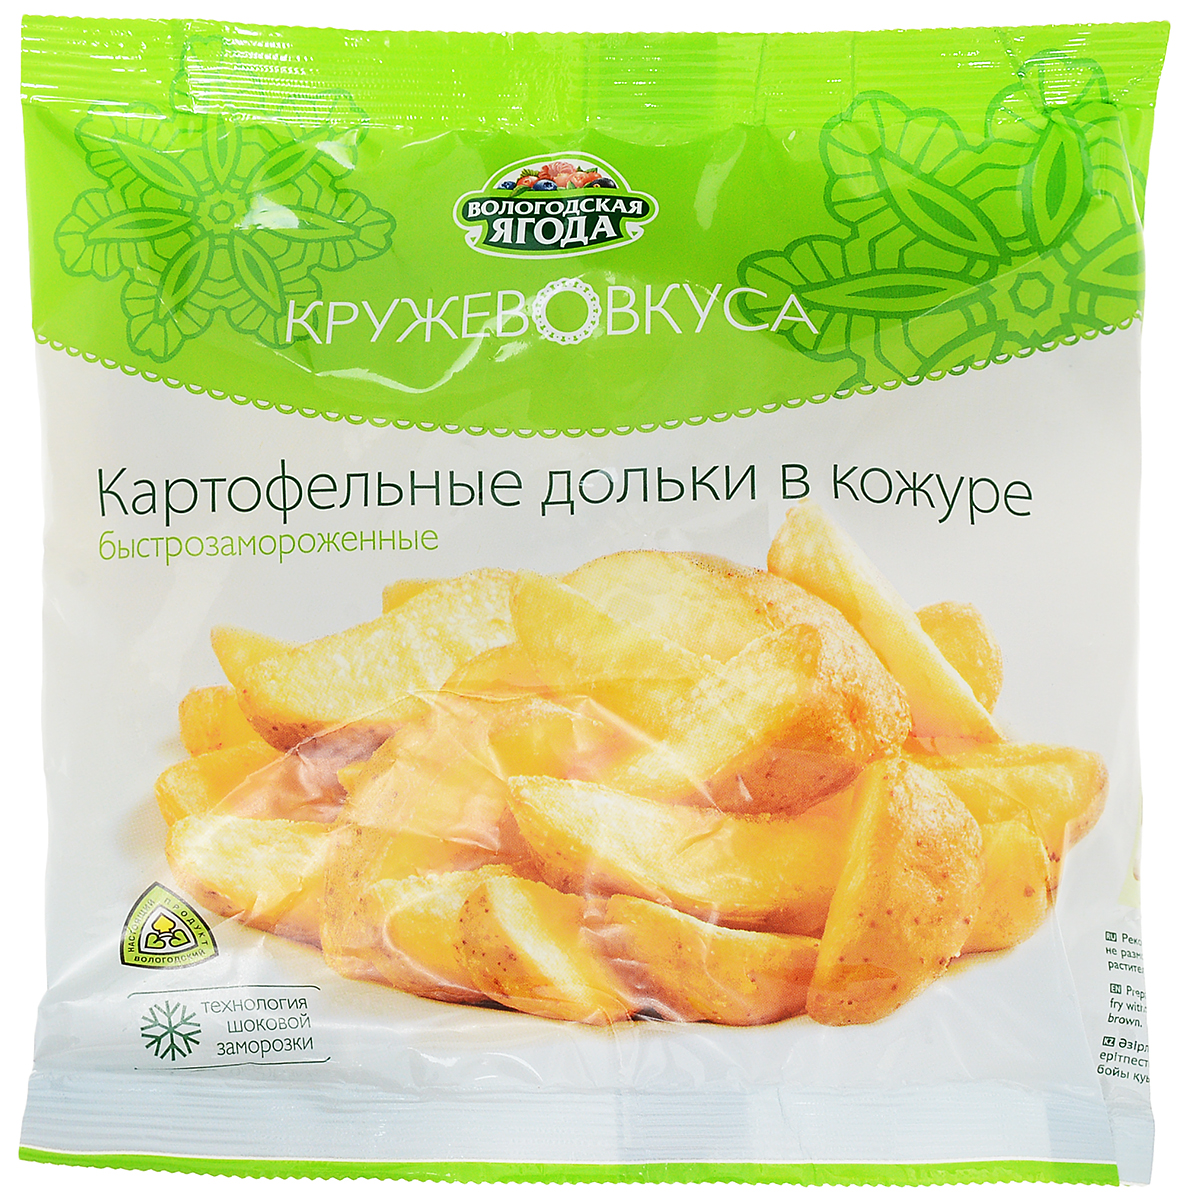 Кружево Вкуса Картофельные дольки, 400 г кружево вкуса щавелевый суп 400 г